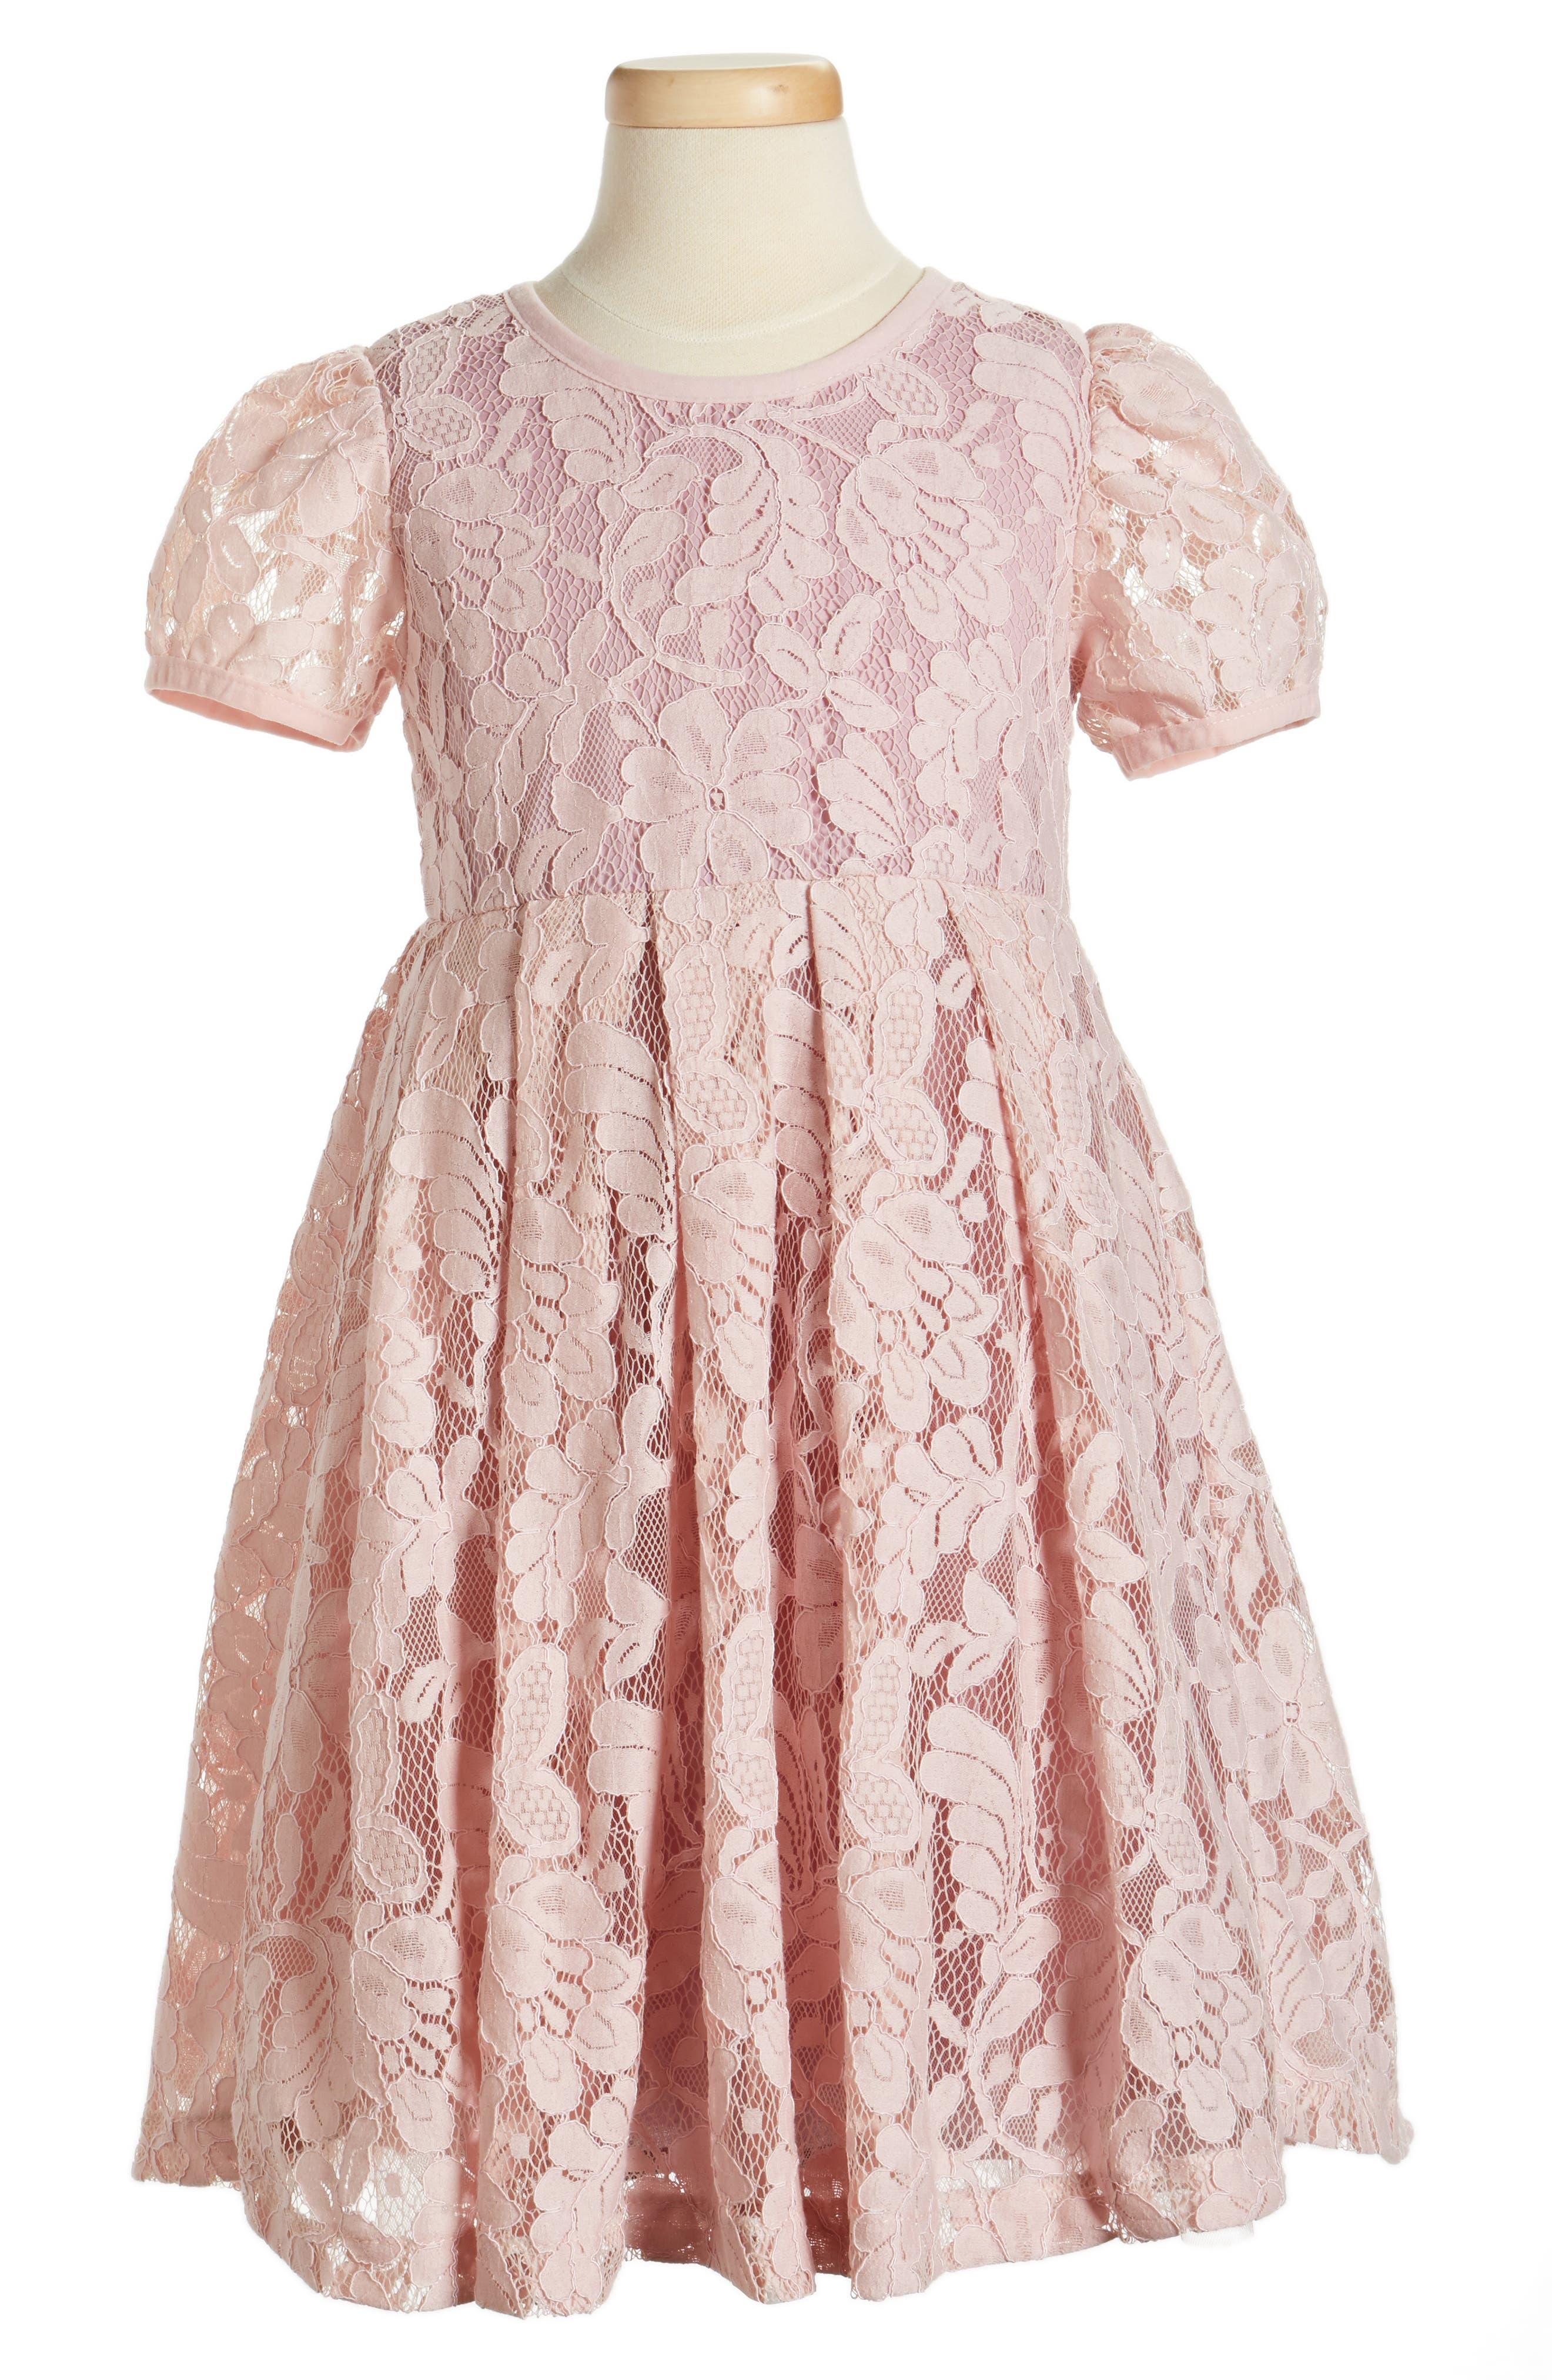 Pink Dresses for Girls